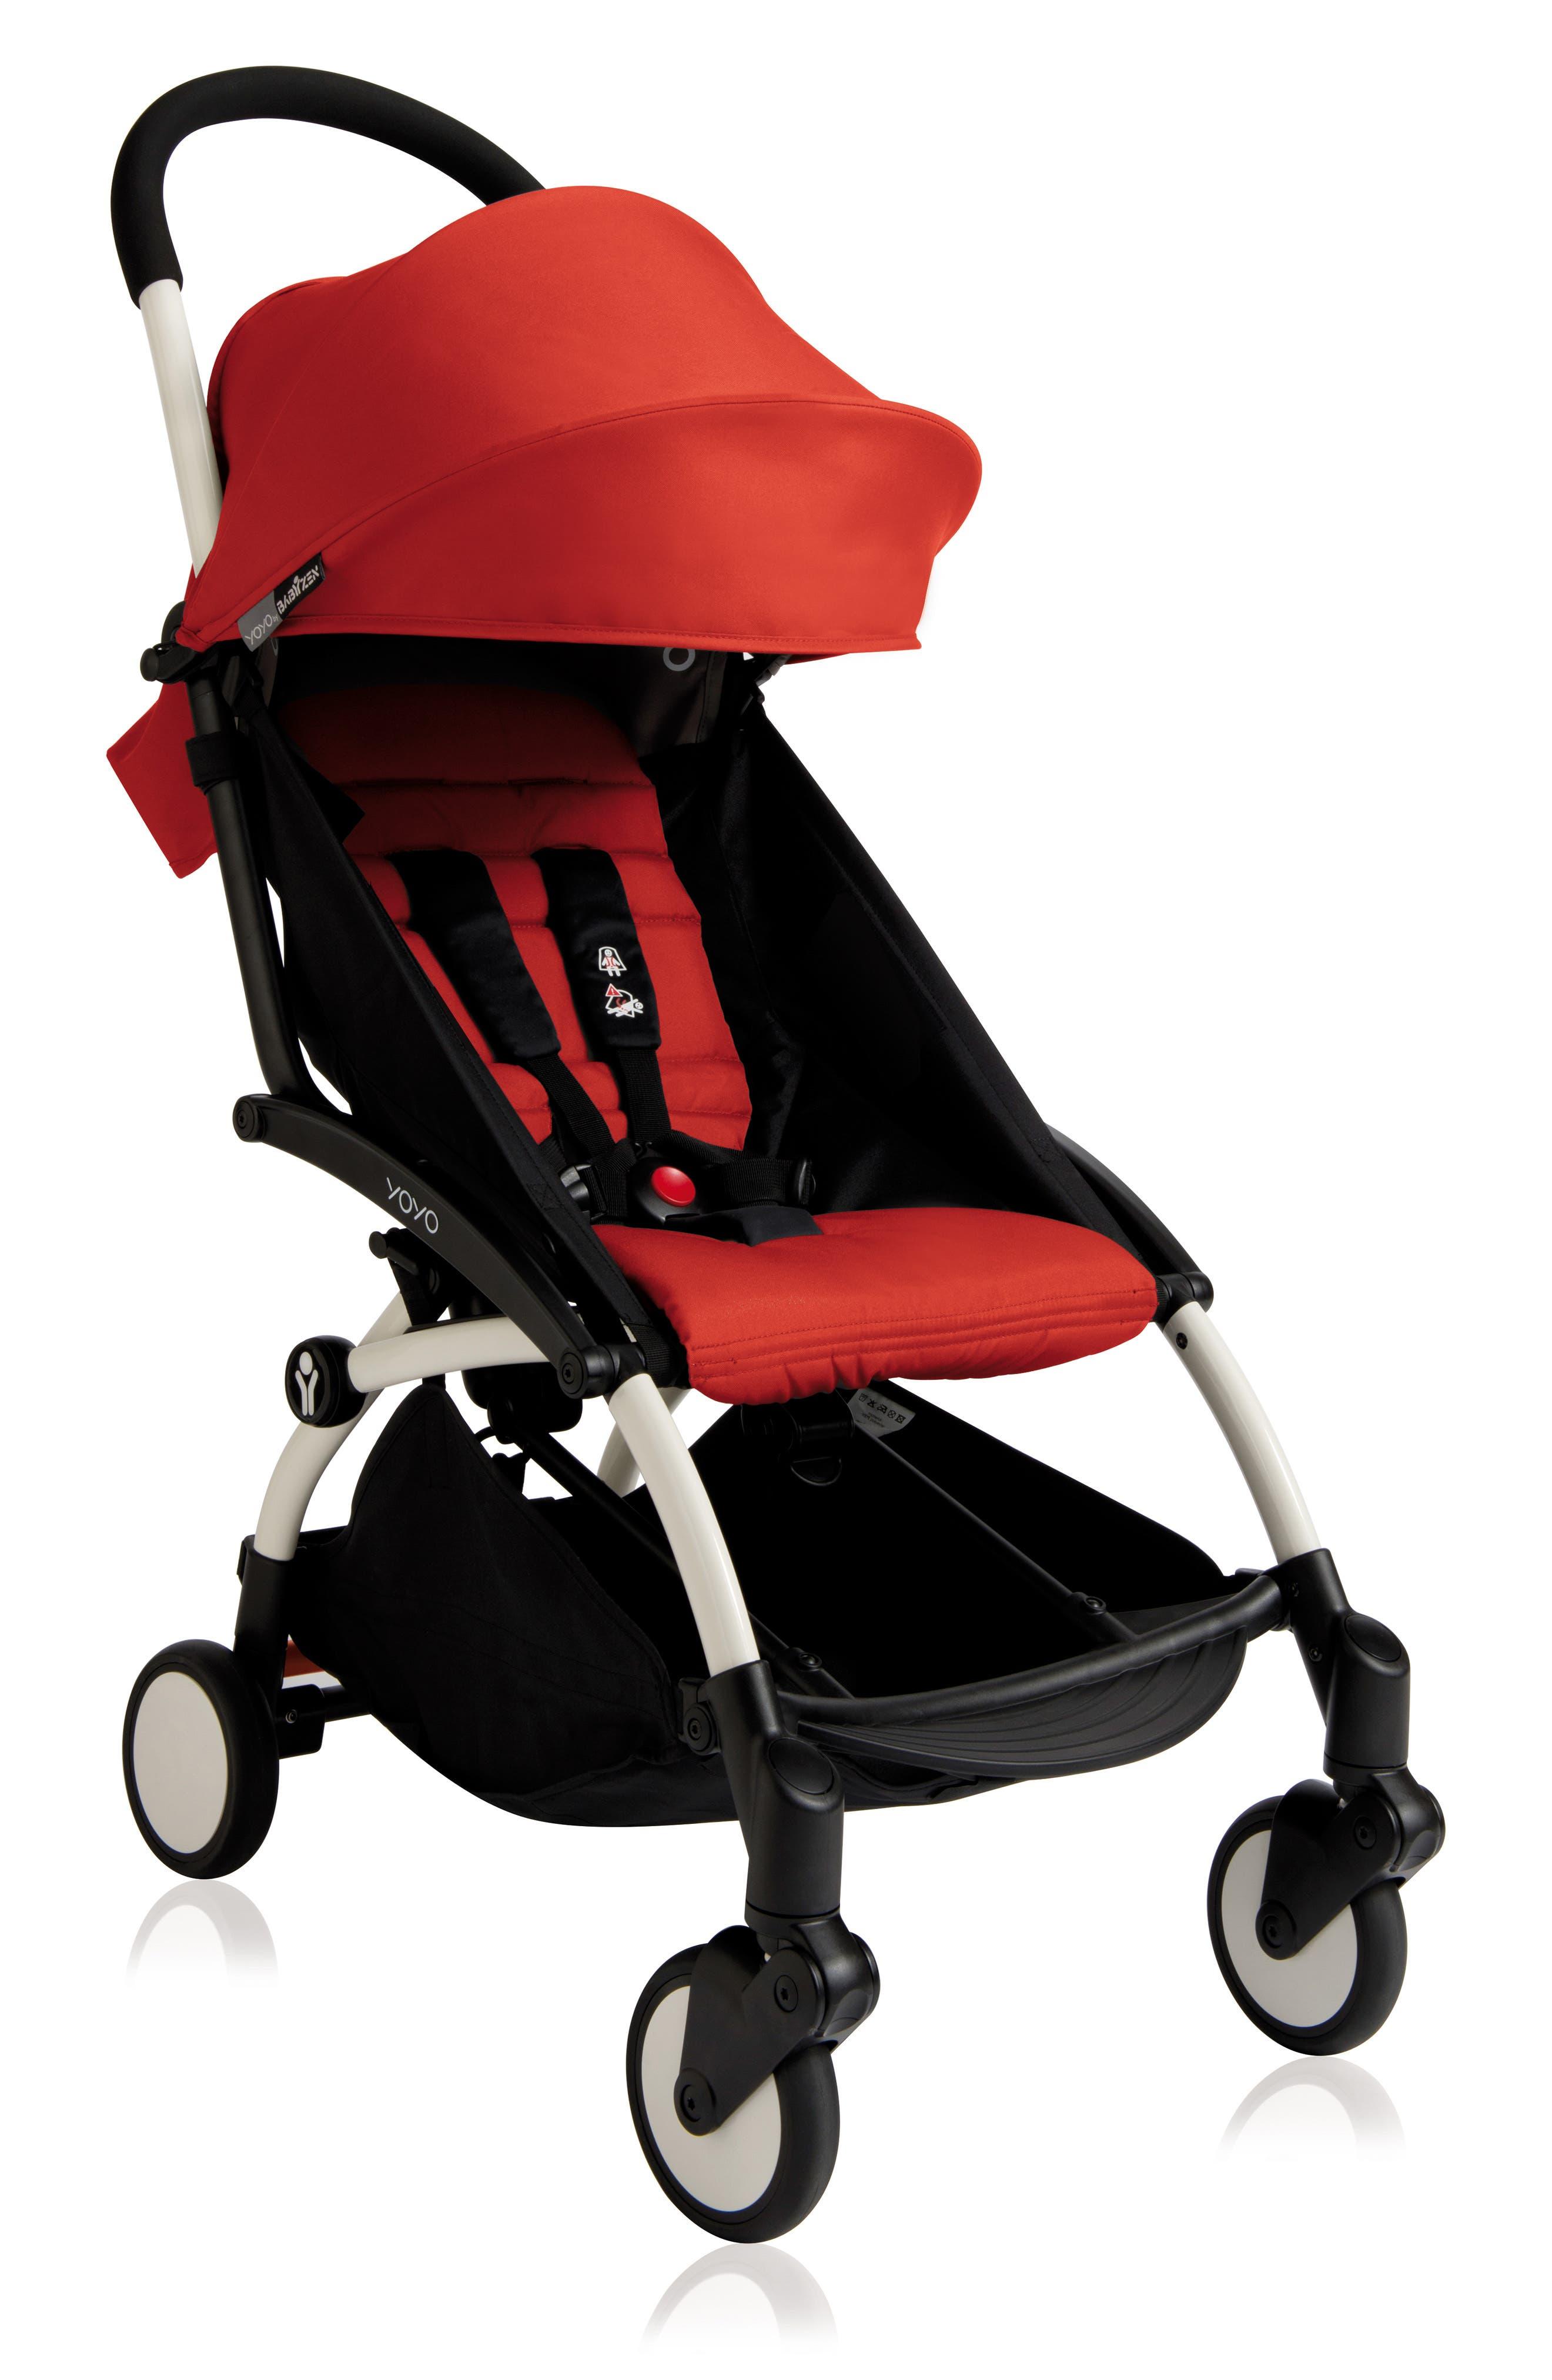 Infant Babyzen(TM) Yoyo Complete Stroller With Travel Bag Black Parasol  New Leg Rest Size One Size  Red